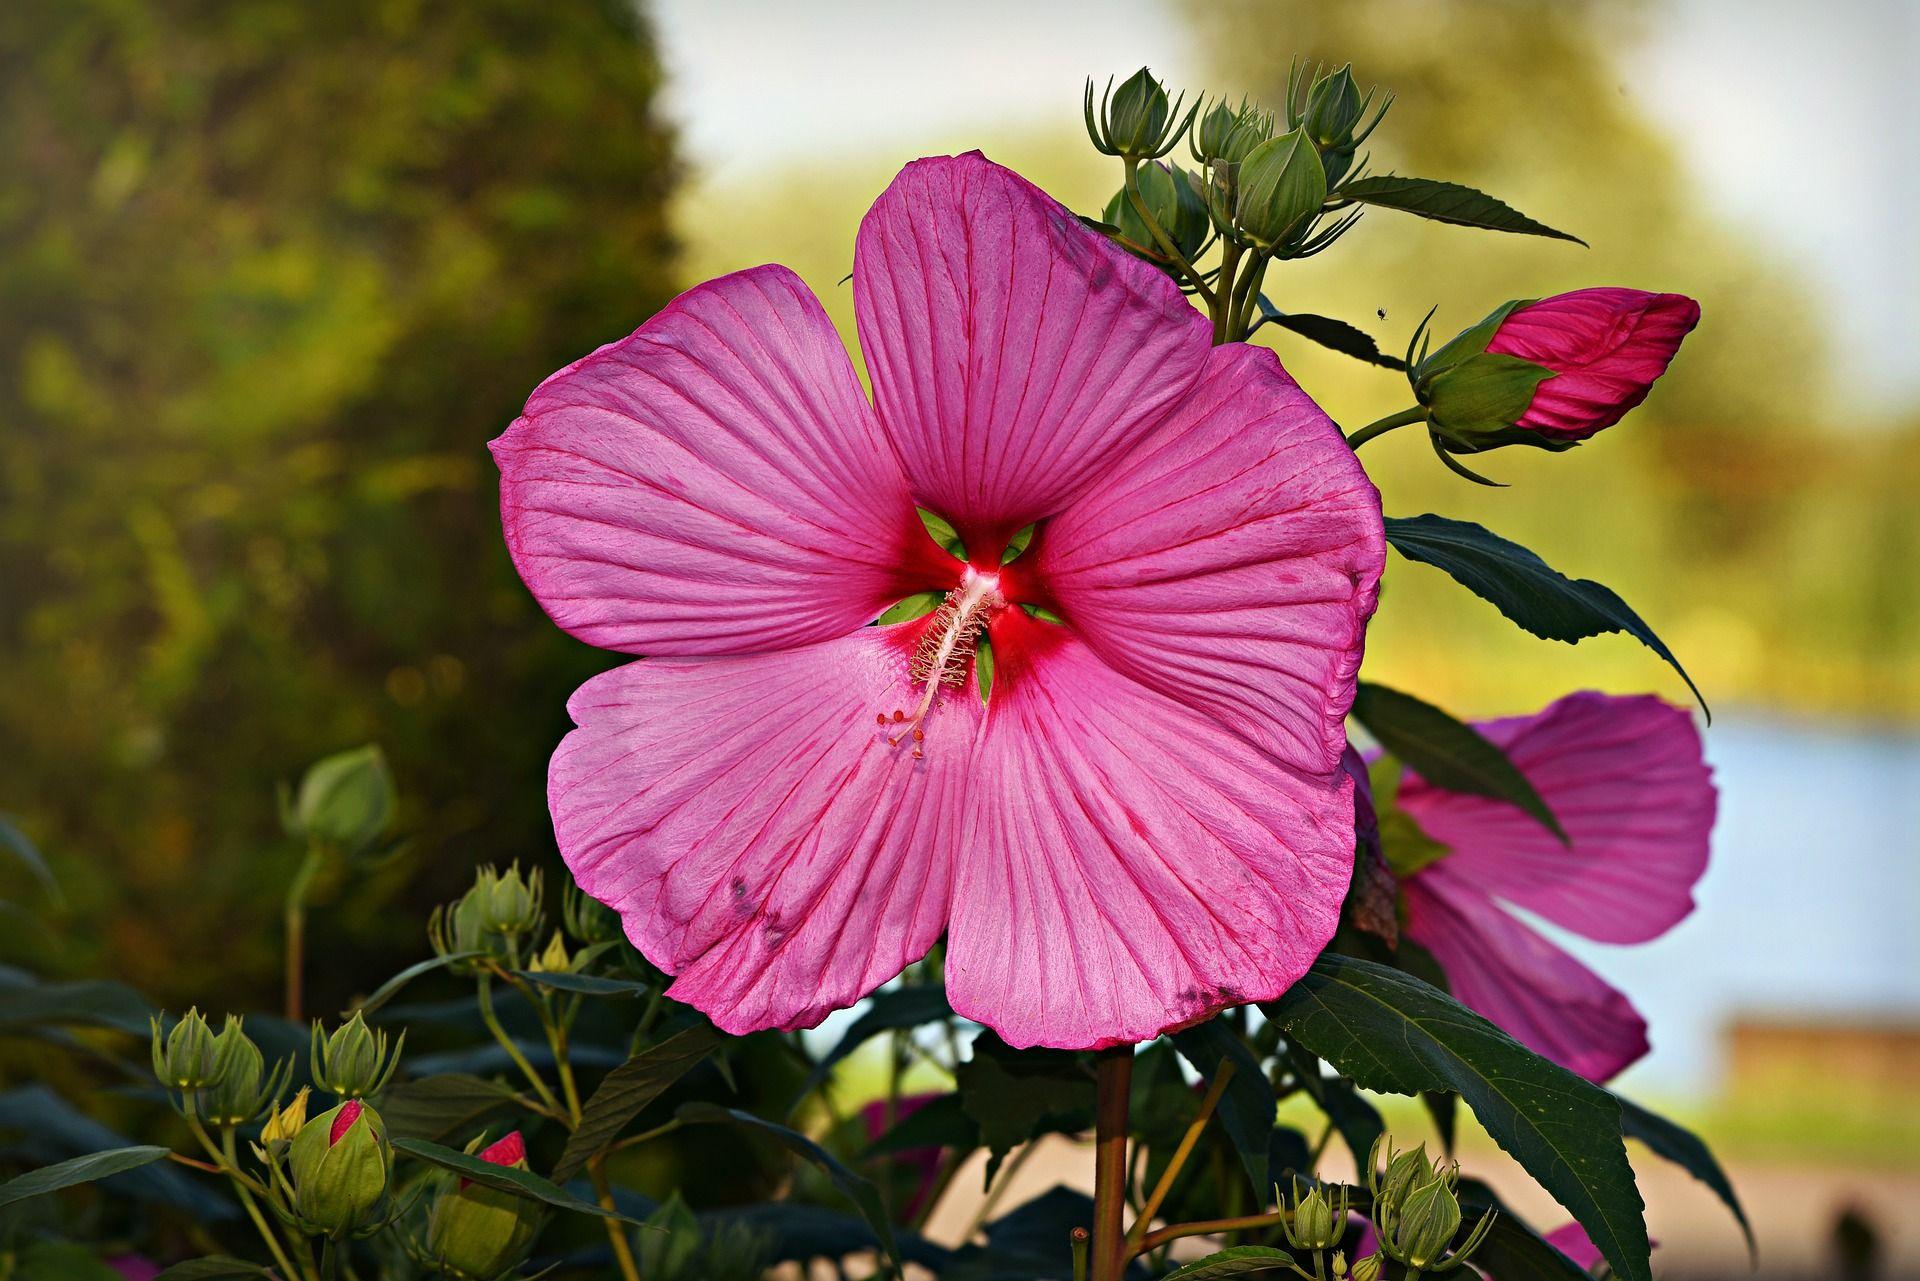 Hibiscus Flower 6 Benefits For Beautiful Skin Beautiful Flowers Images Hibiscus Flower Images